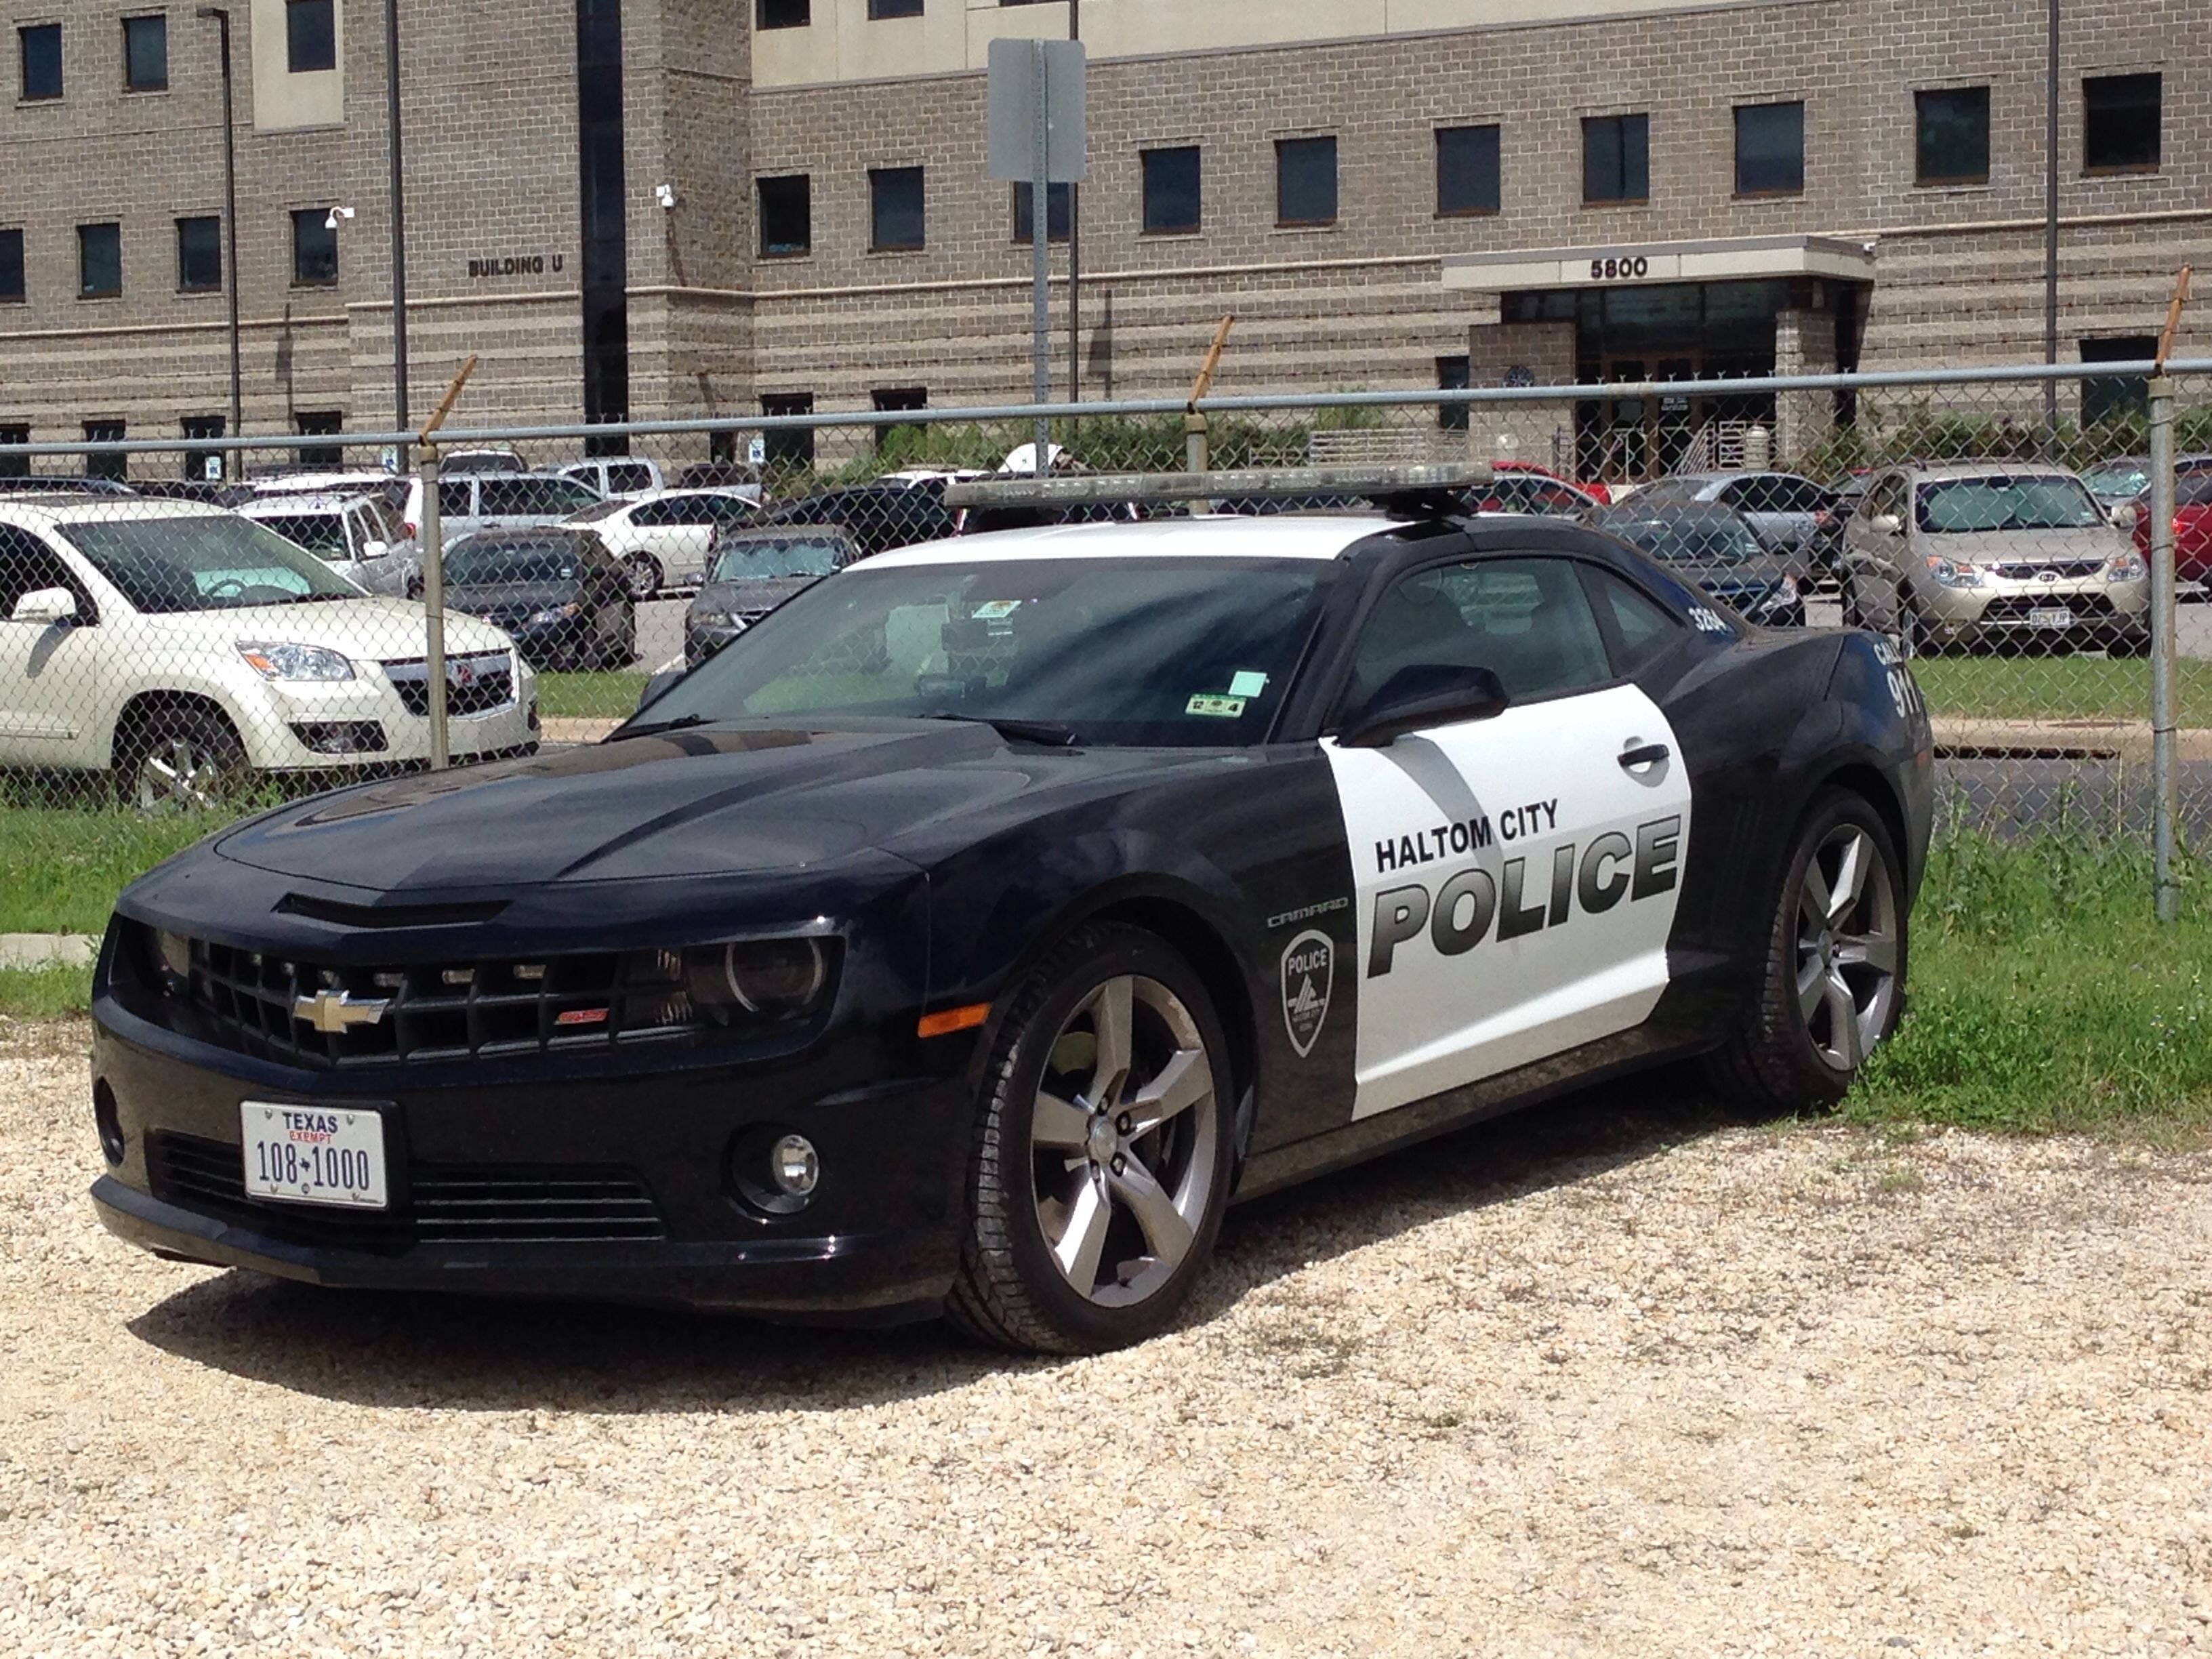 Haltom City Police Tx Camaro Policecar Police Cars Emergency Vehicles Police